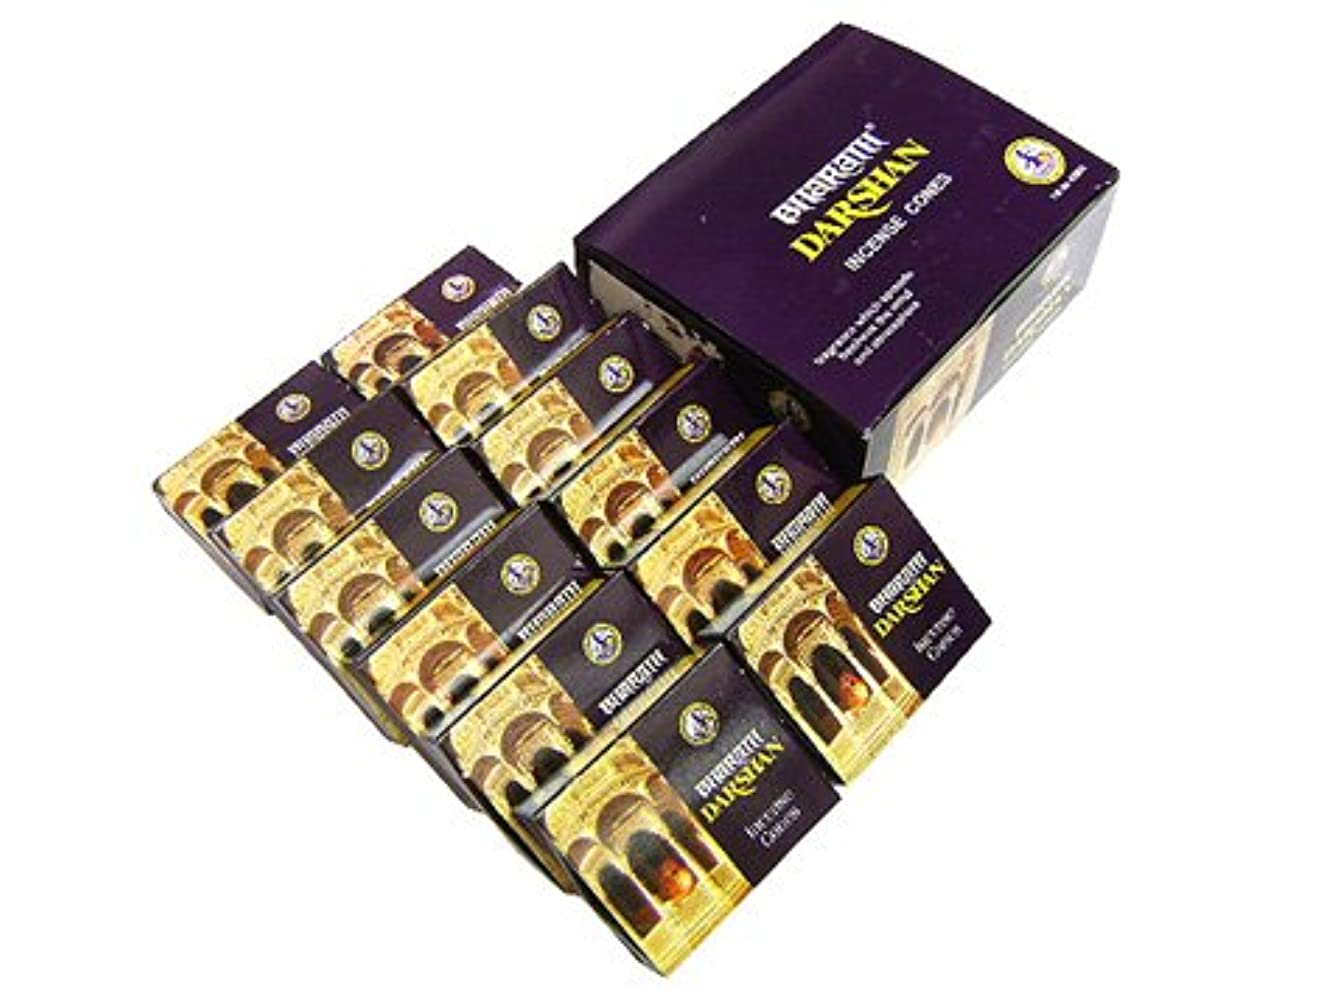 ASOKA TRADING(アショーカ トレーディング) バハラットダルシャン香コーンタイプ TRADING BHARATH DARSHAN CORN 12箱セット